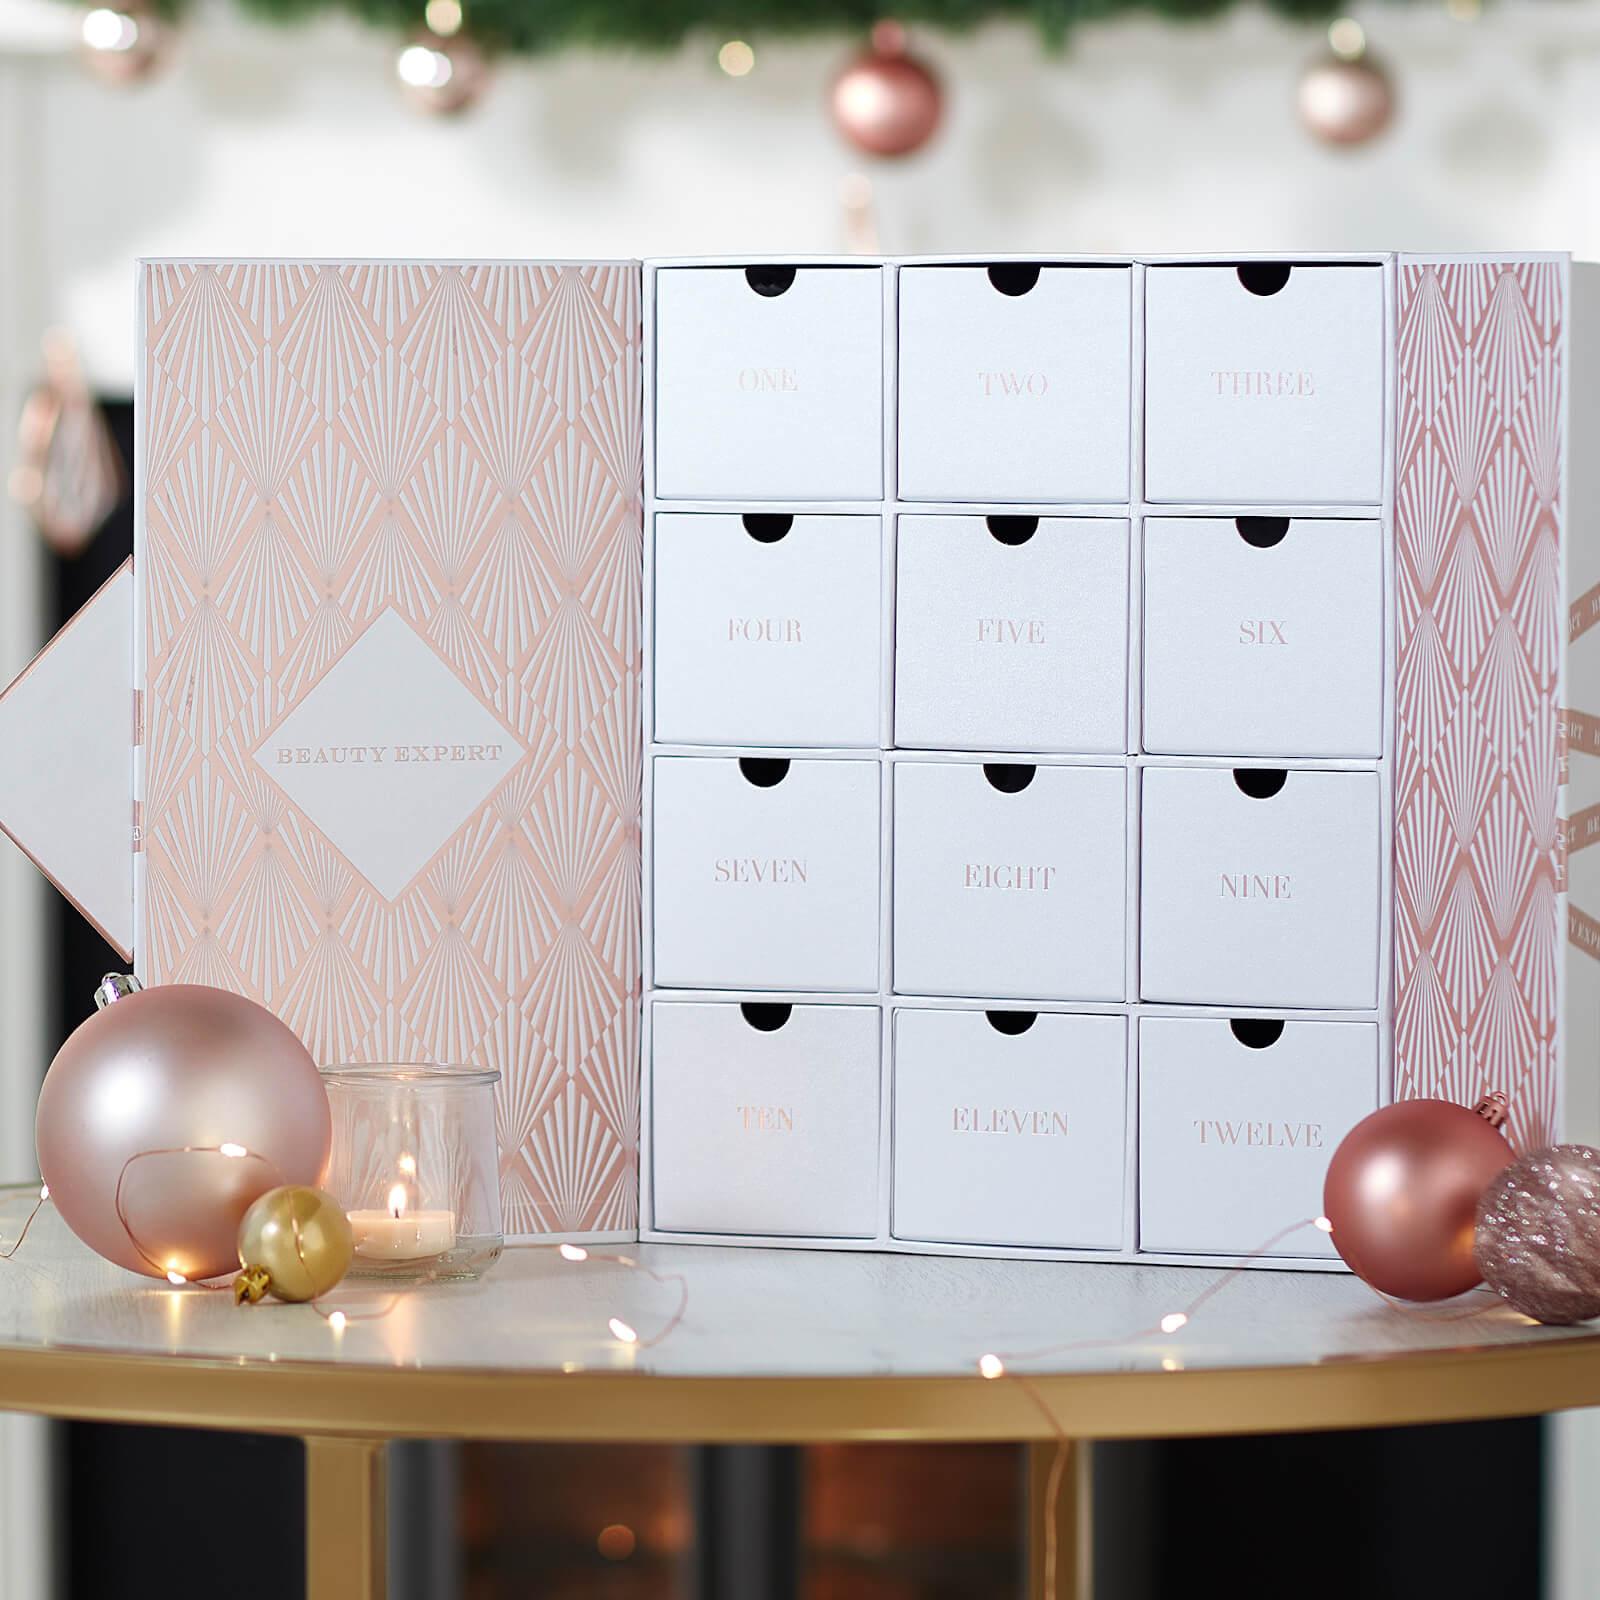 Beauty Expert 12 Days of Christmas Advent Calendar 2020